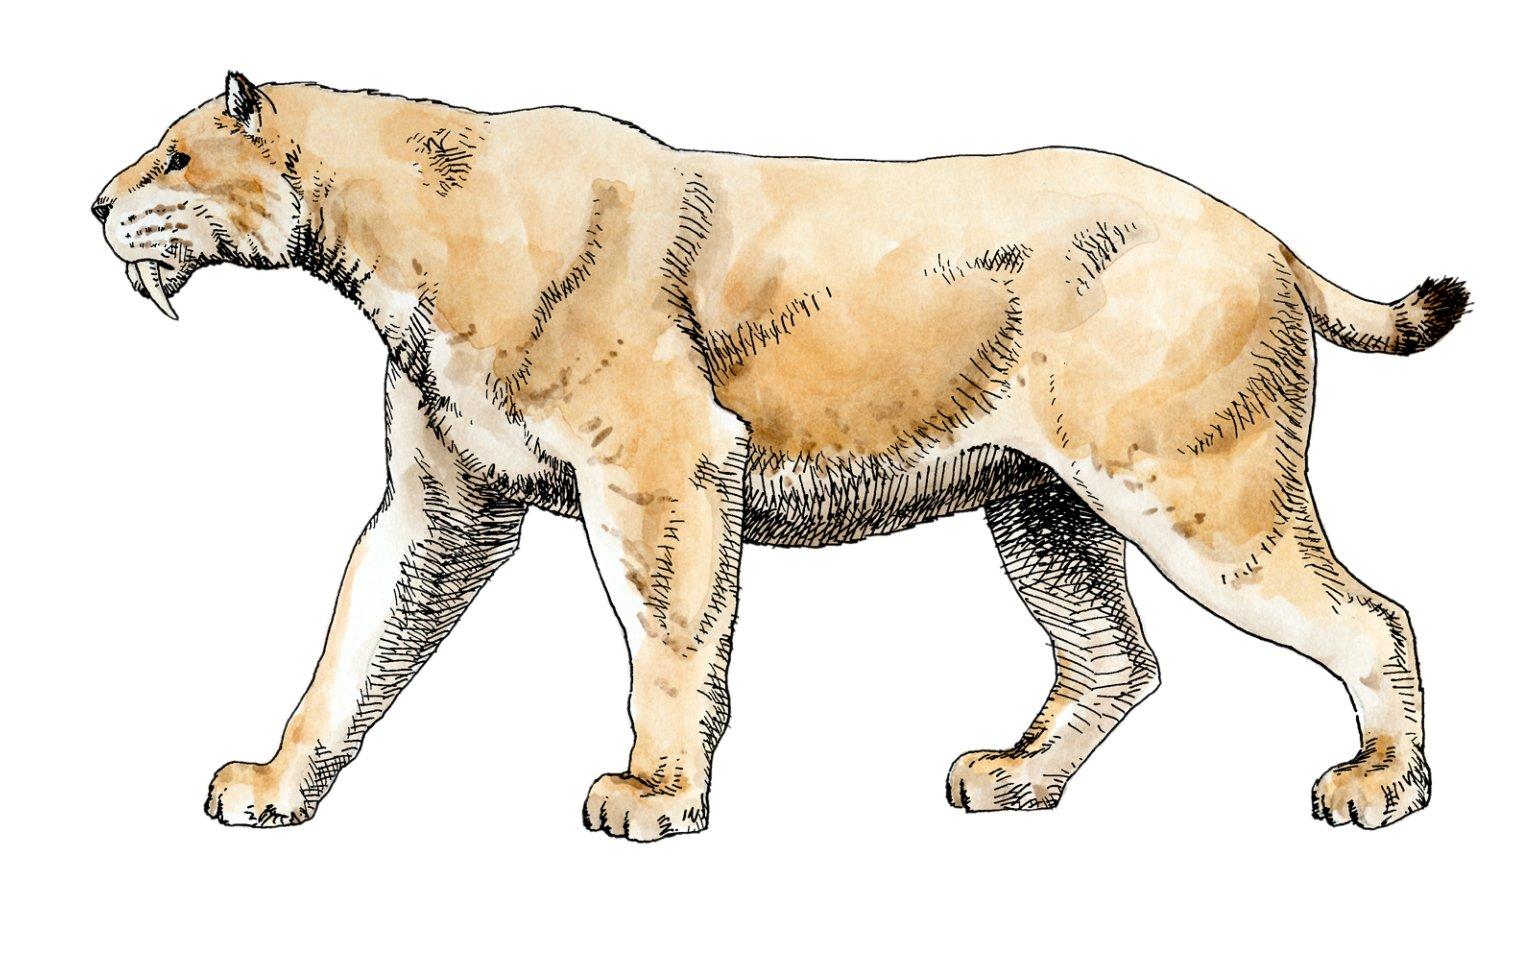 Sabertooth, Ice Age Mammal